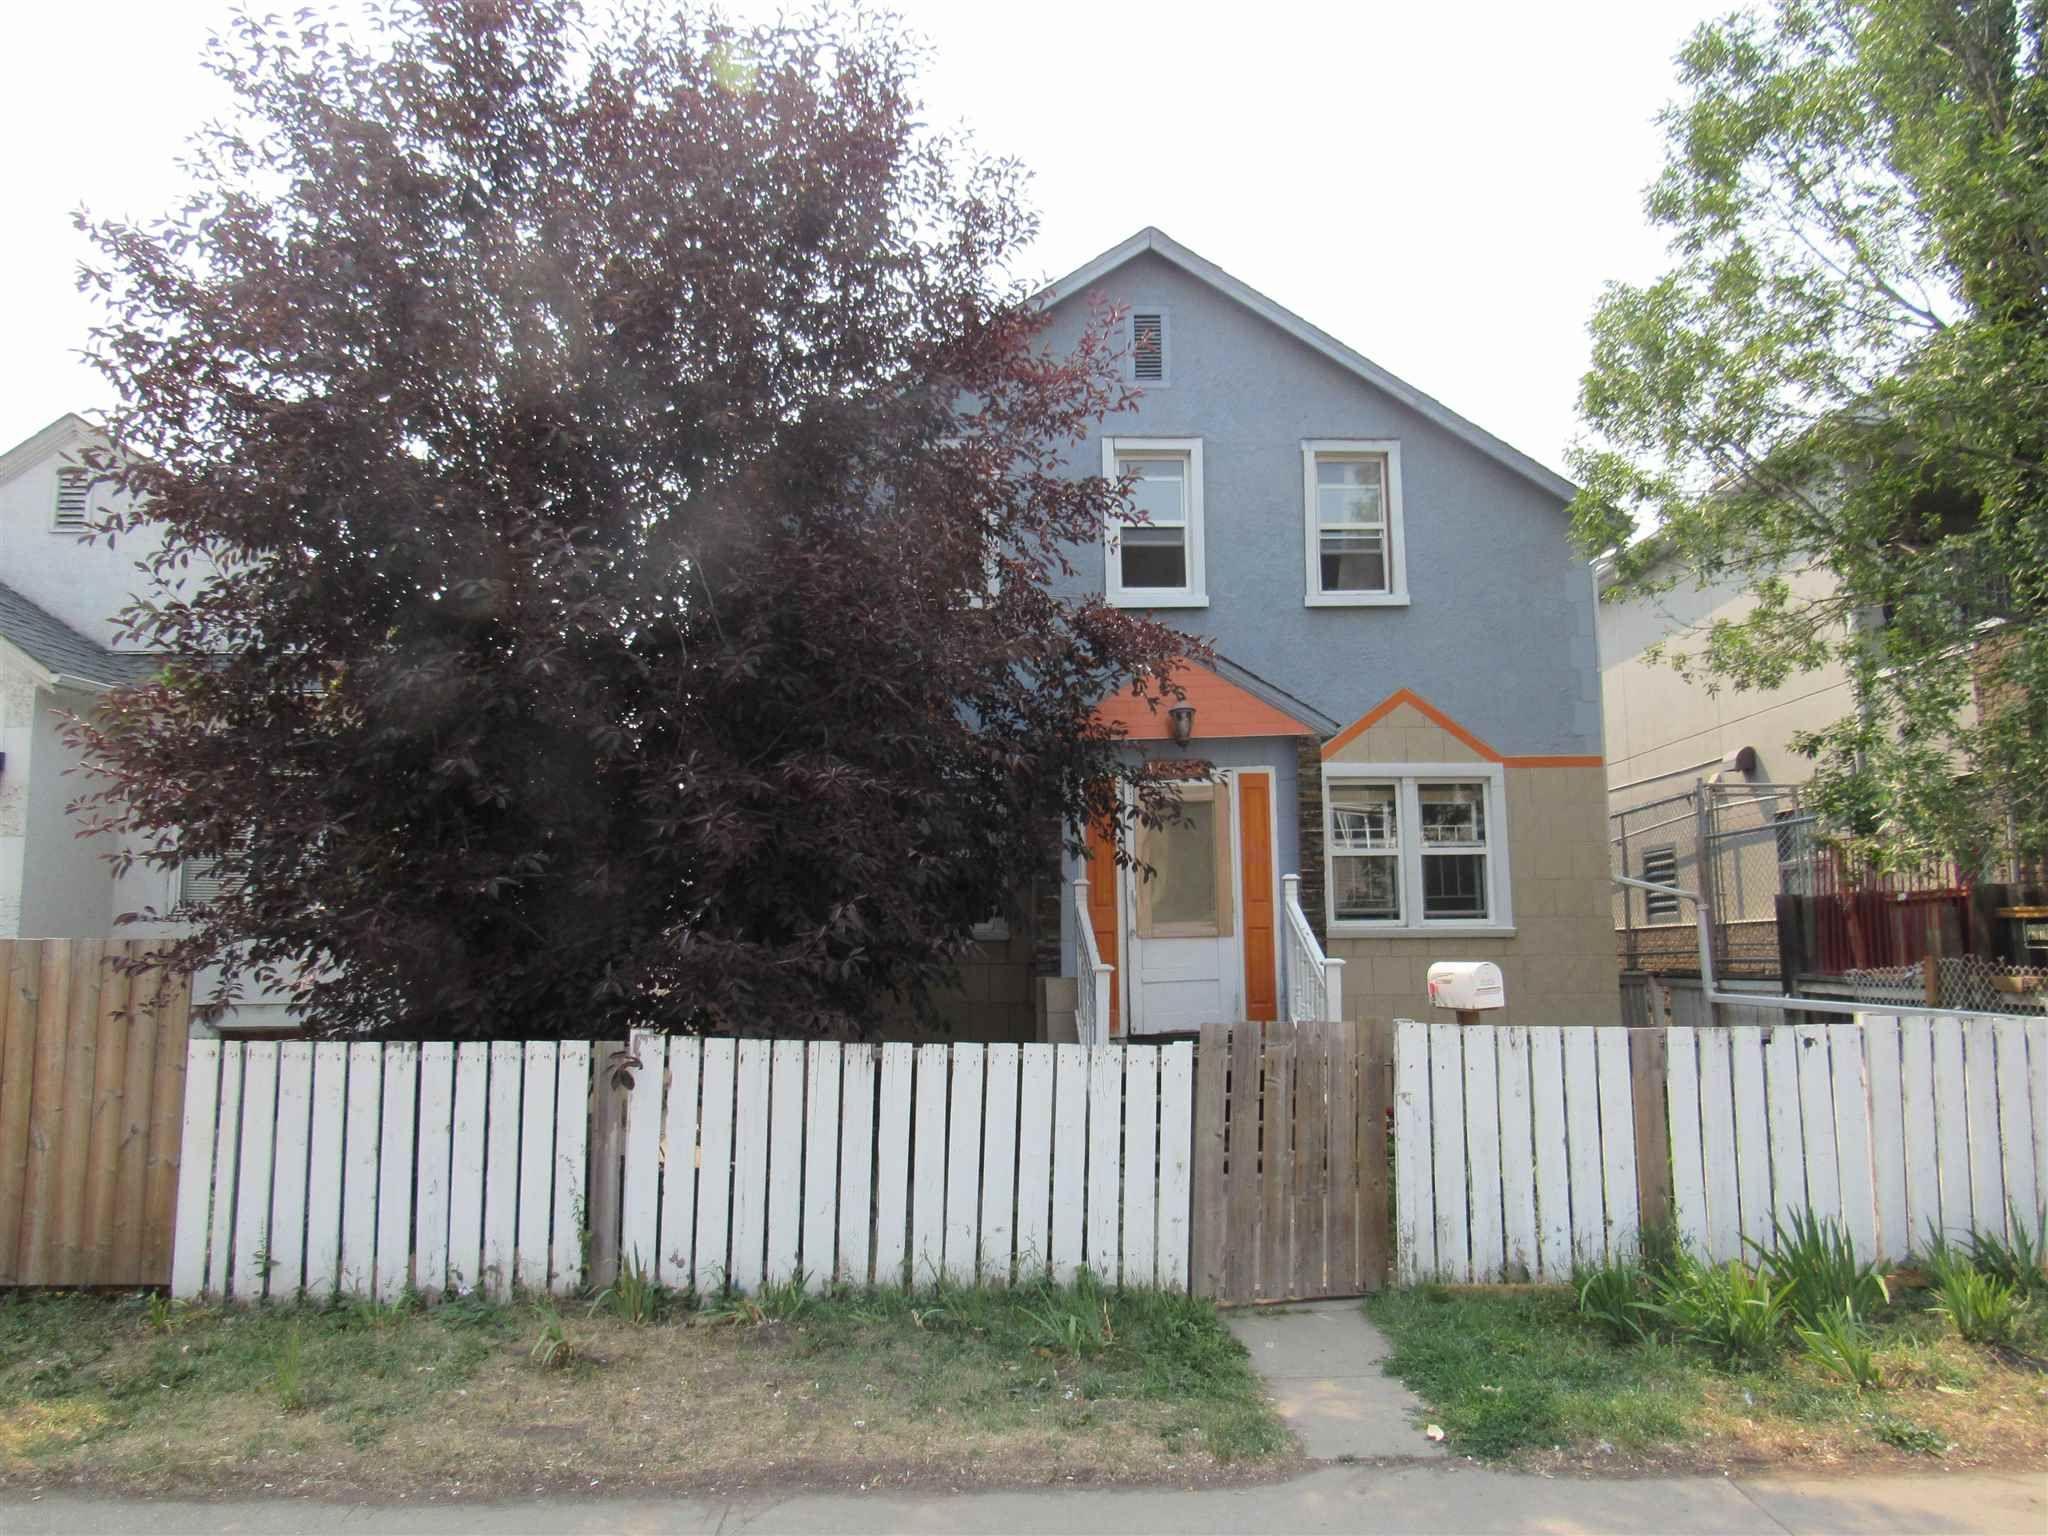 Main Photo: 10620 96 Street in Edmonton: Zone 13 House for sale : MLS®# E4254969